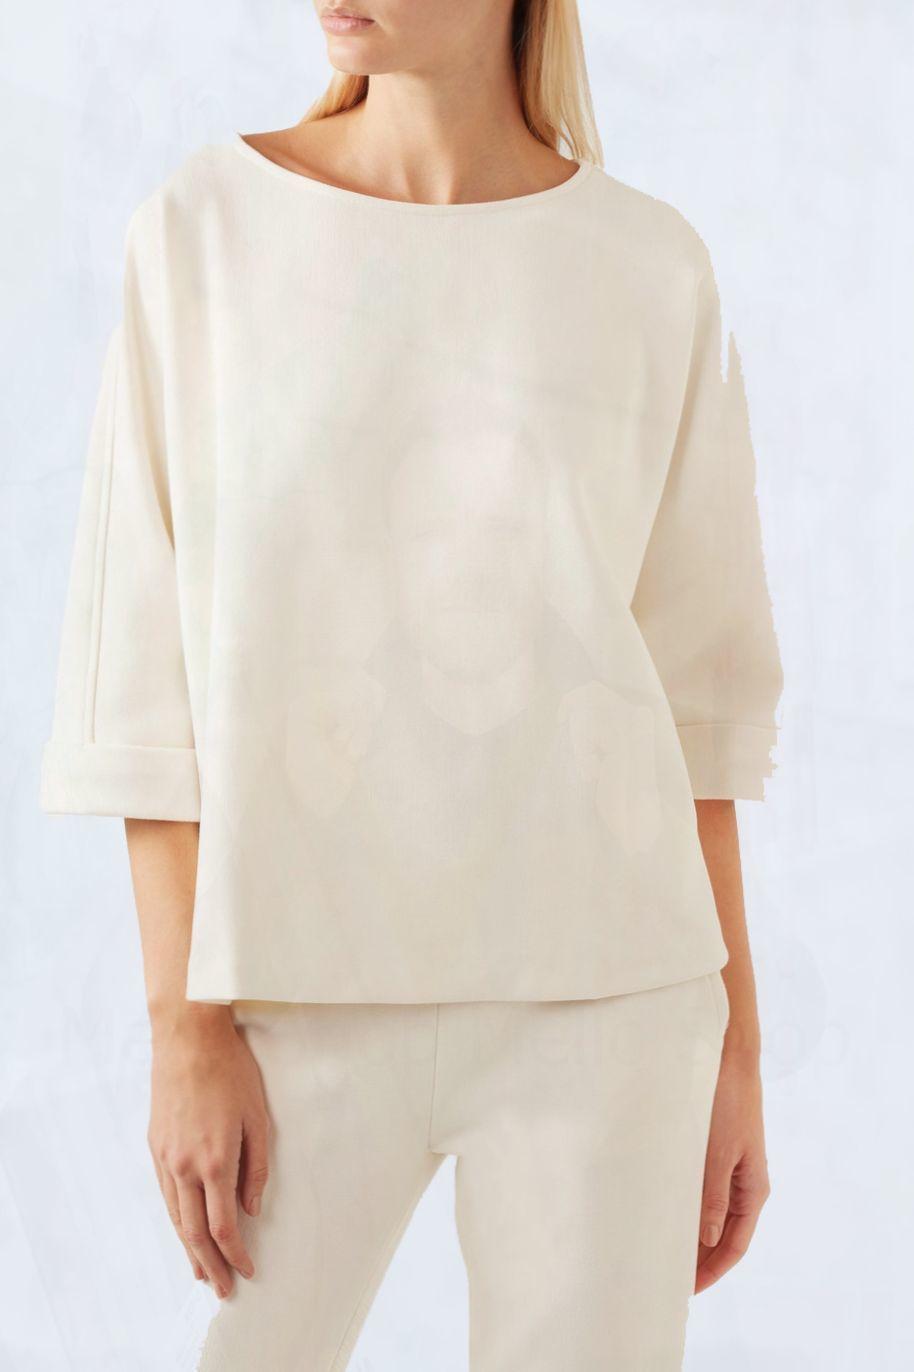 6041183bf00 Пошита · Блузки ручной работы. Женская блузка. Для работы